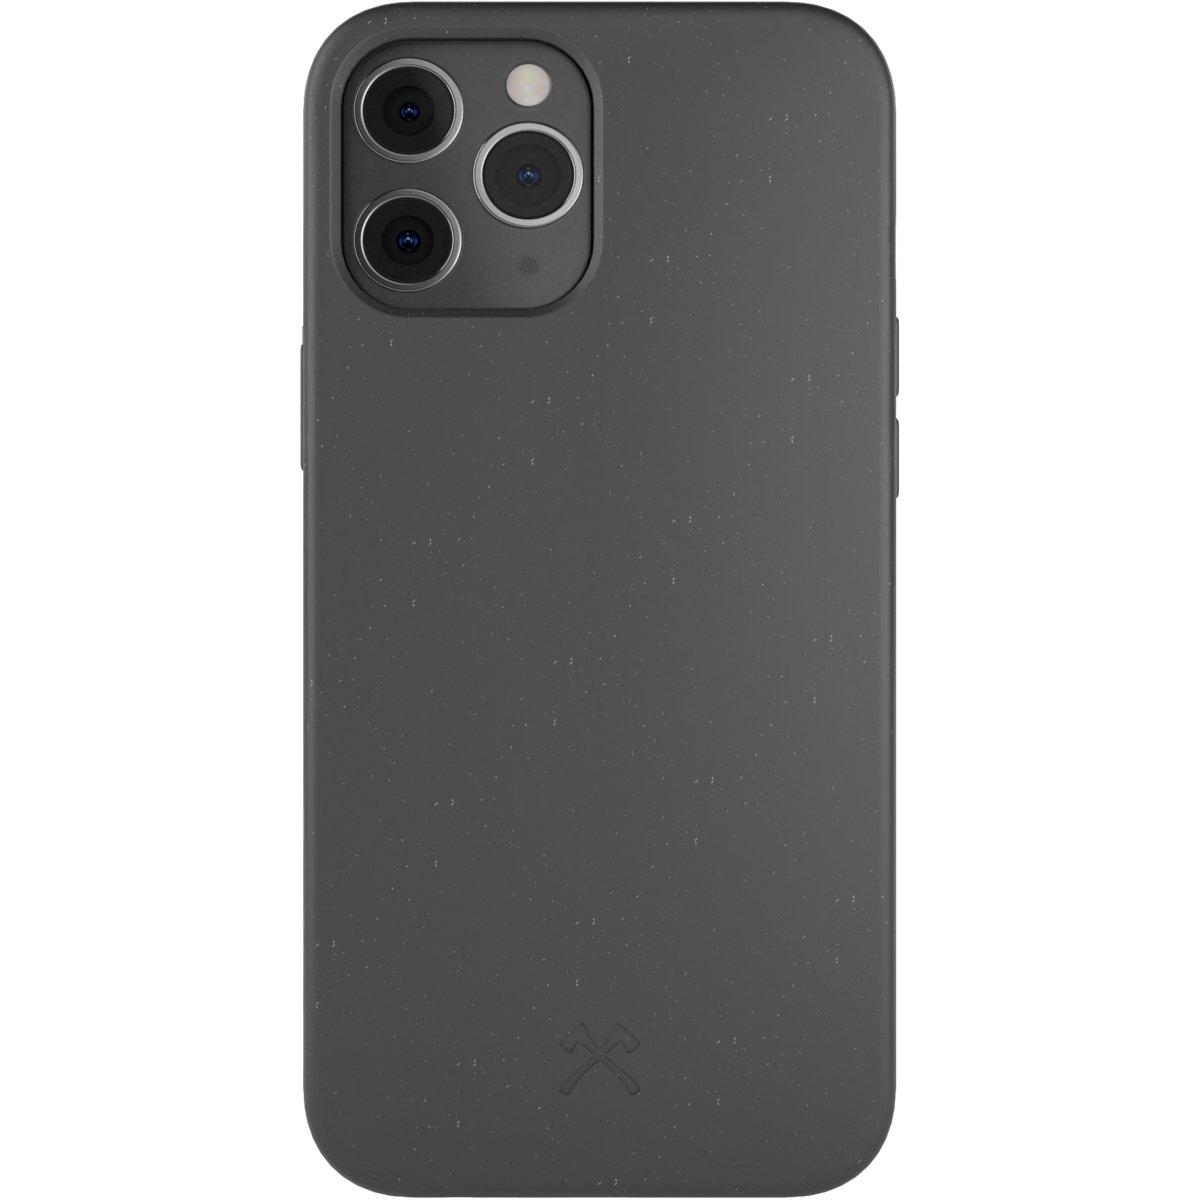 Woodcessories Bio Case AM iPhone 12 / 12 Pro - black